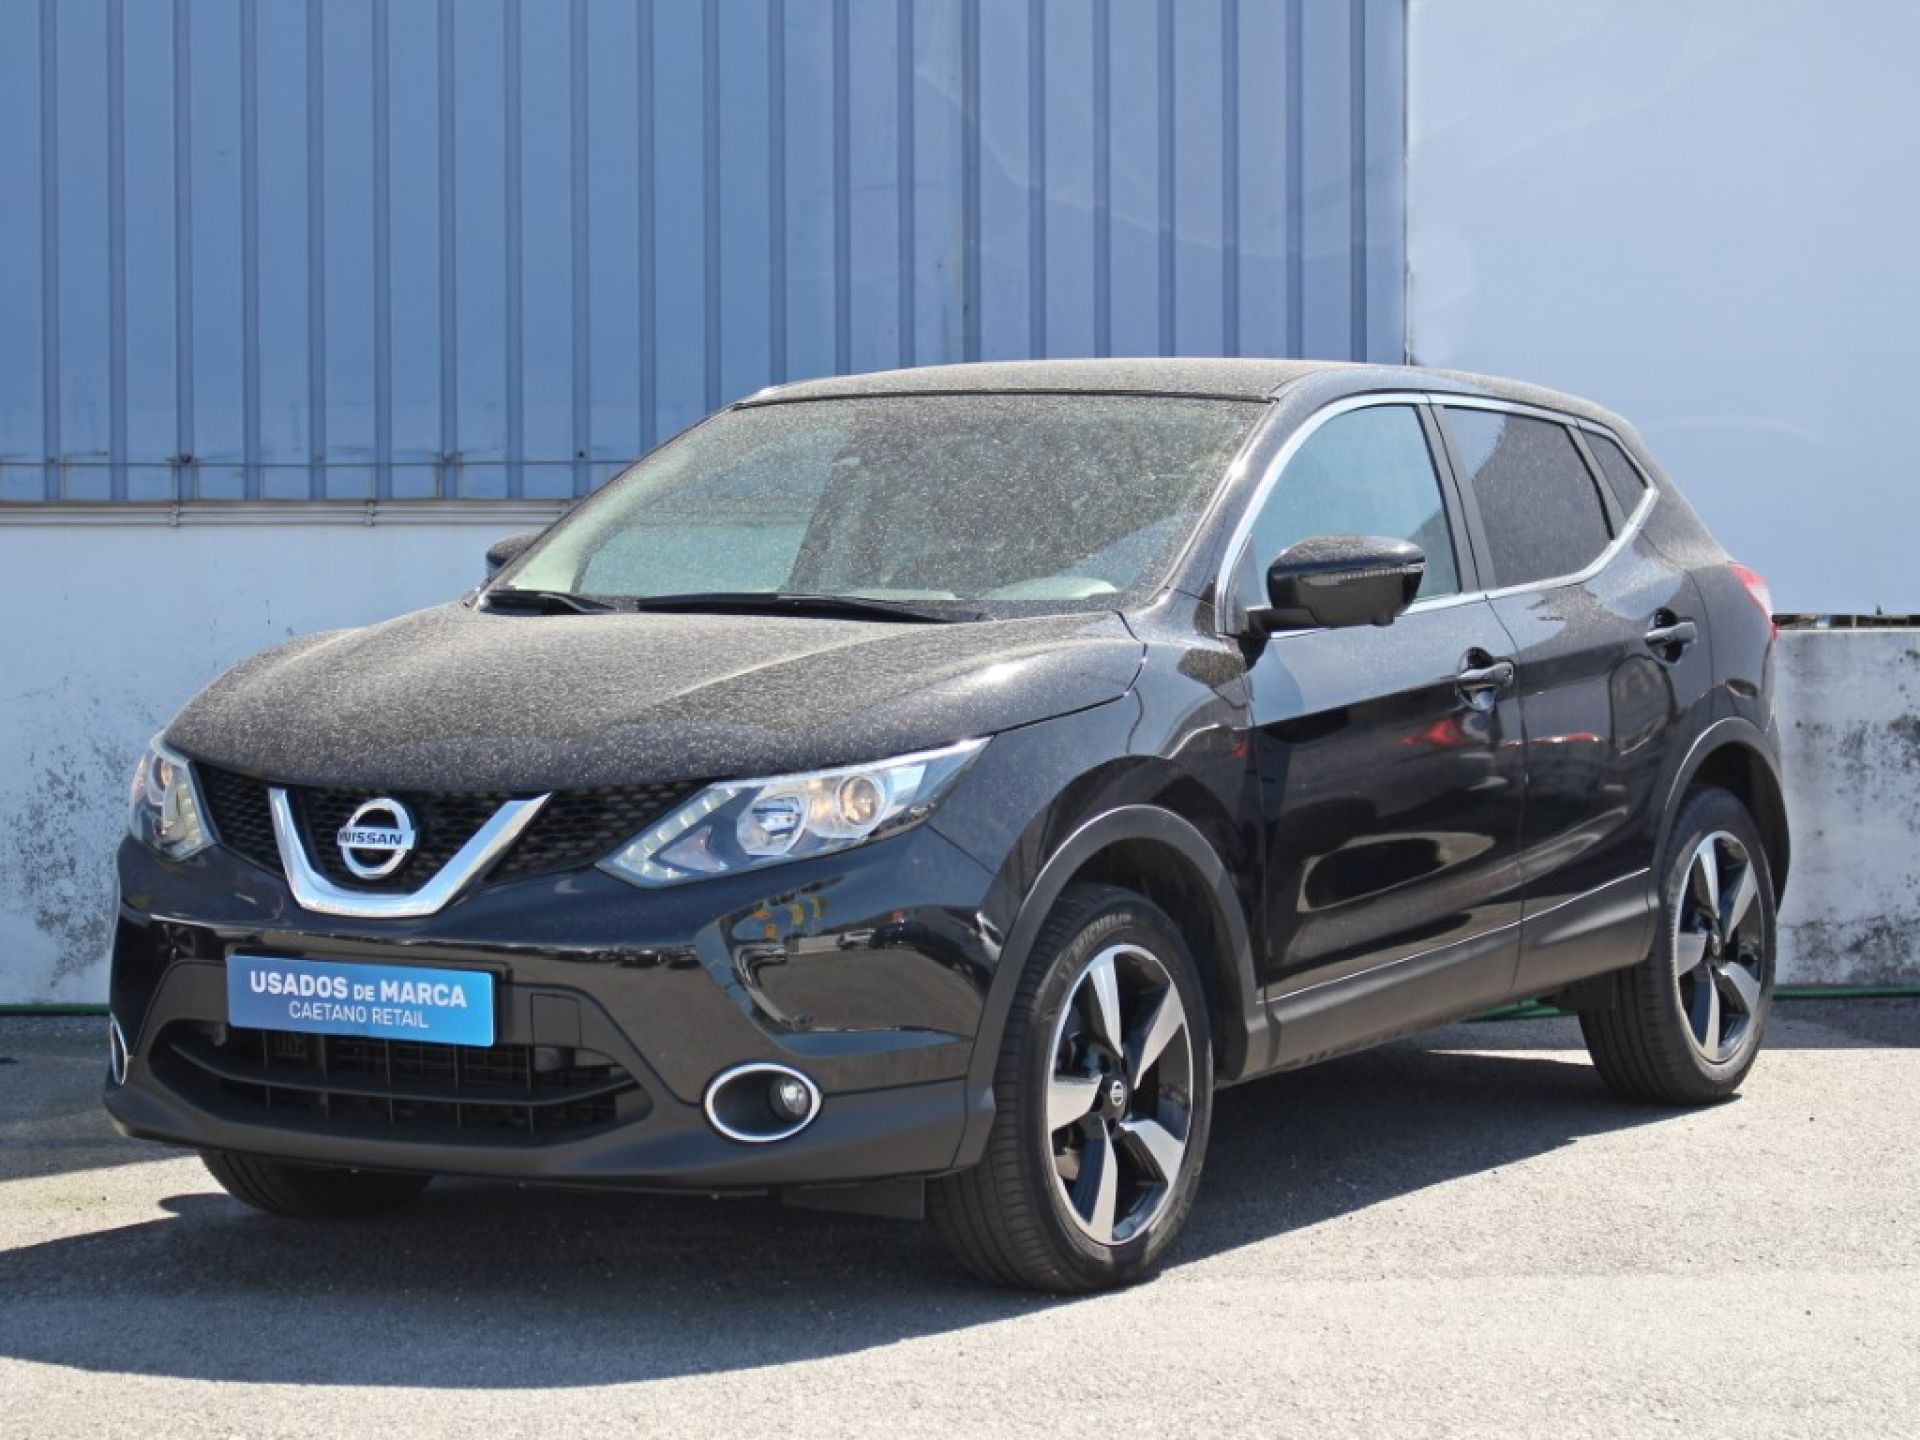 Nissan Qashqai 1.5 dCi N-Connecta S 18 segunda mão Porto